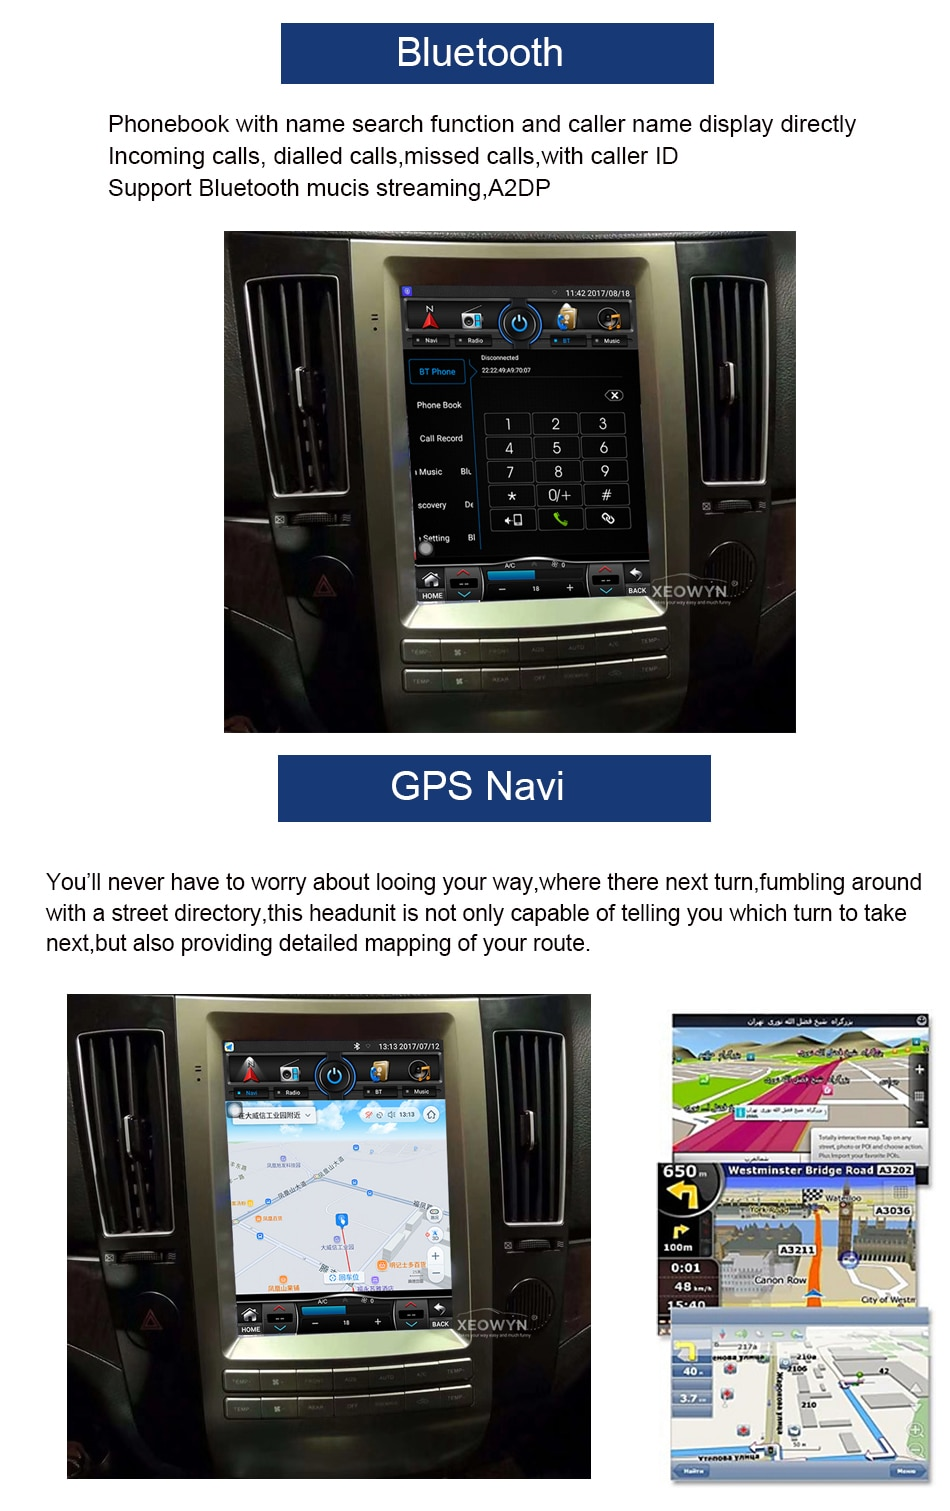 002-GPS BT